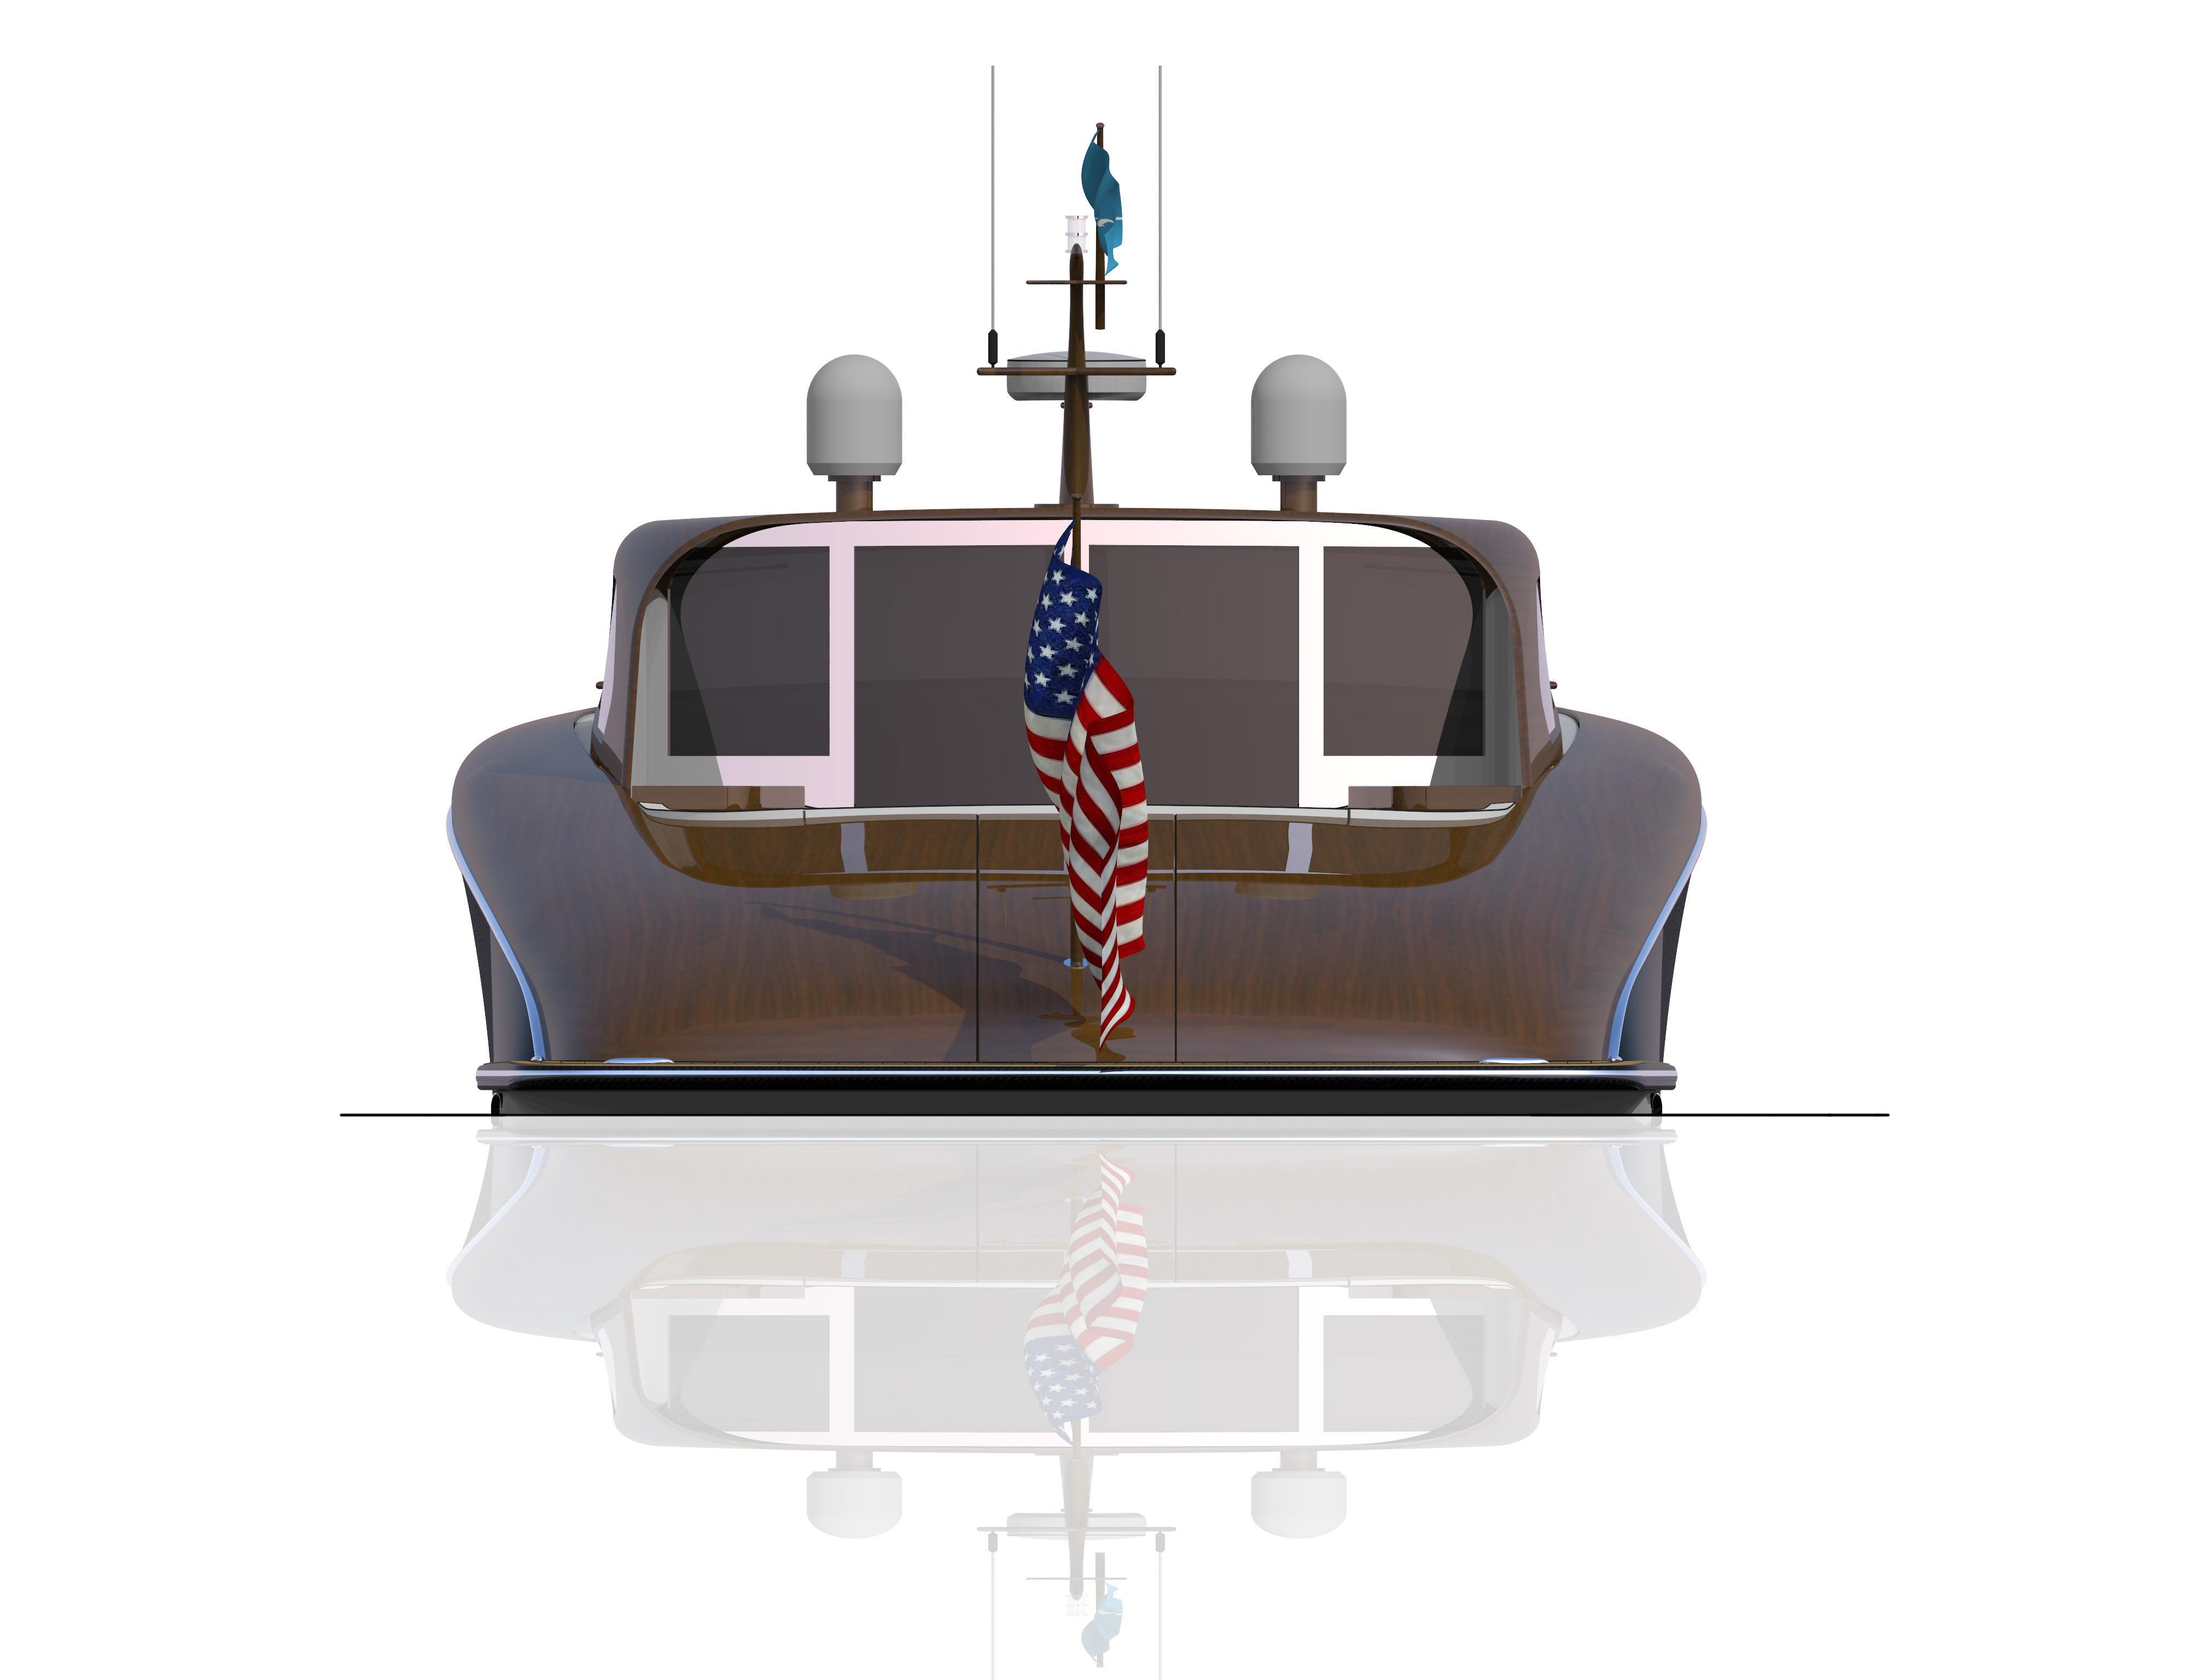 60' Sport Boat Stern View